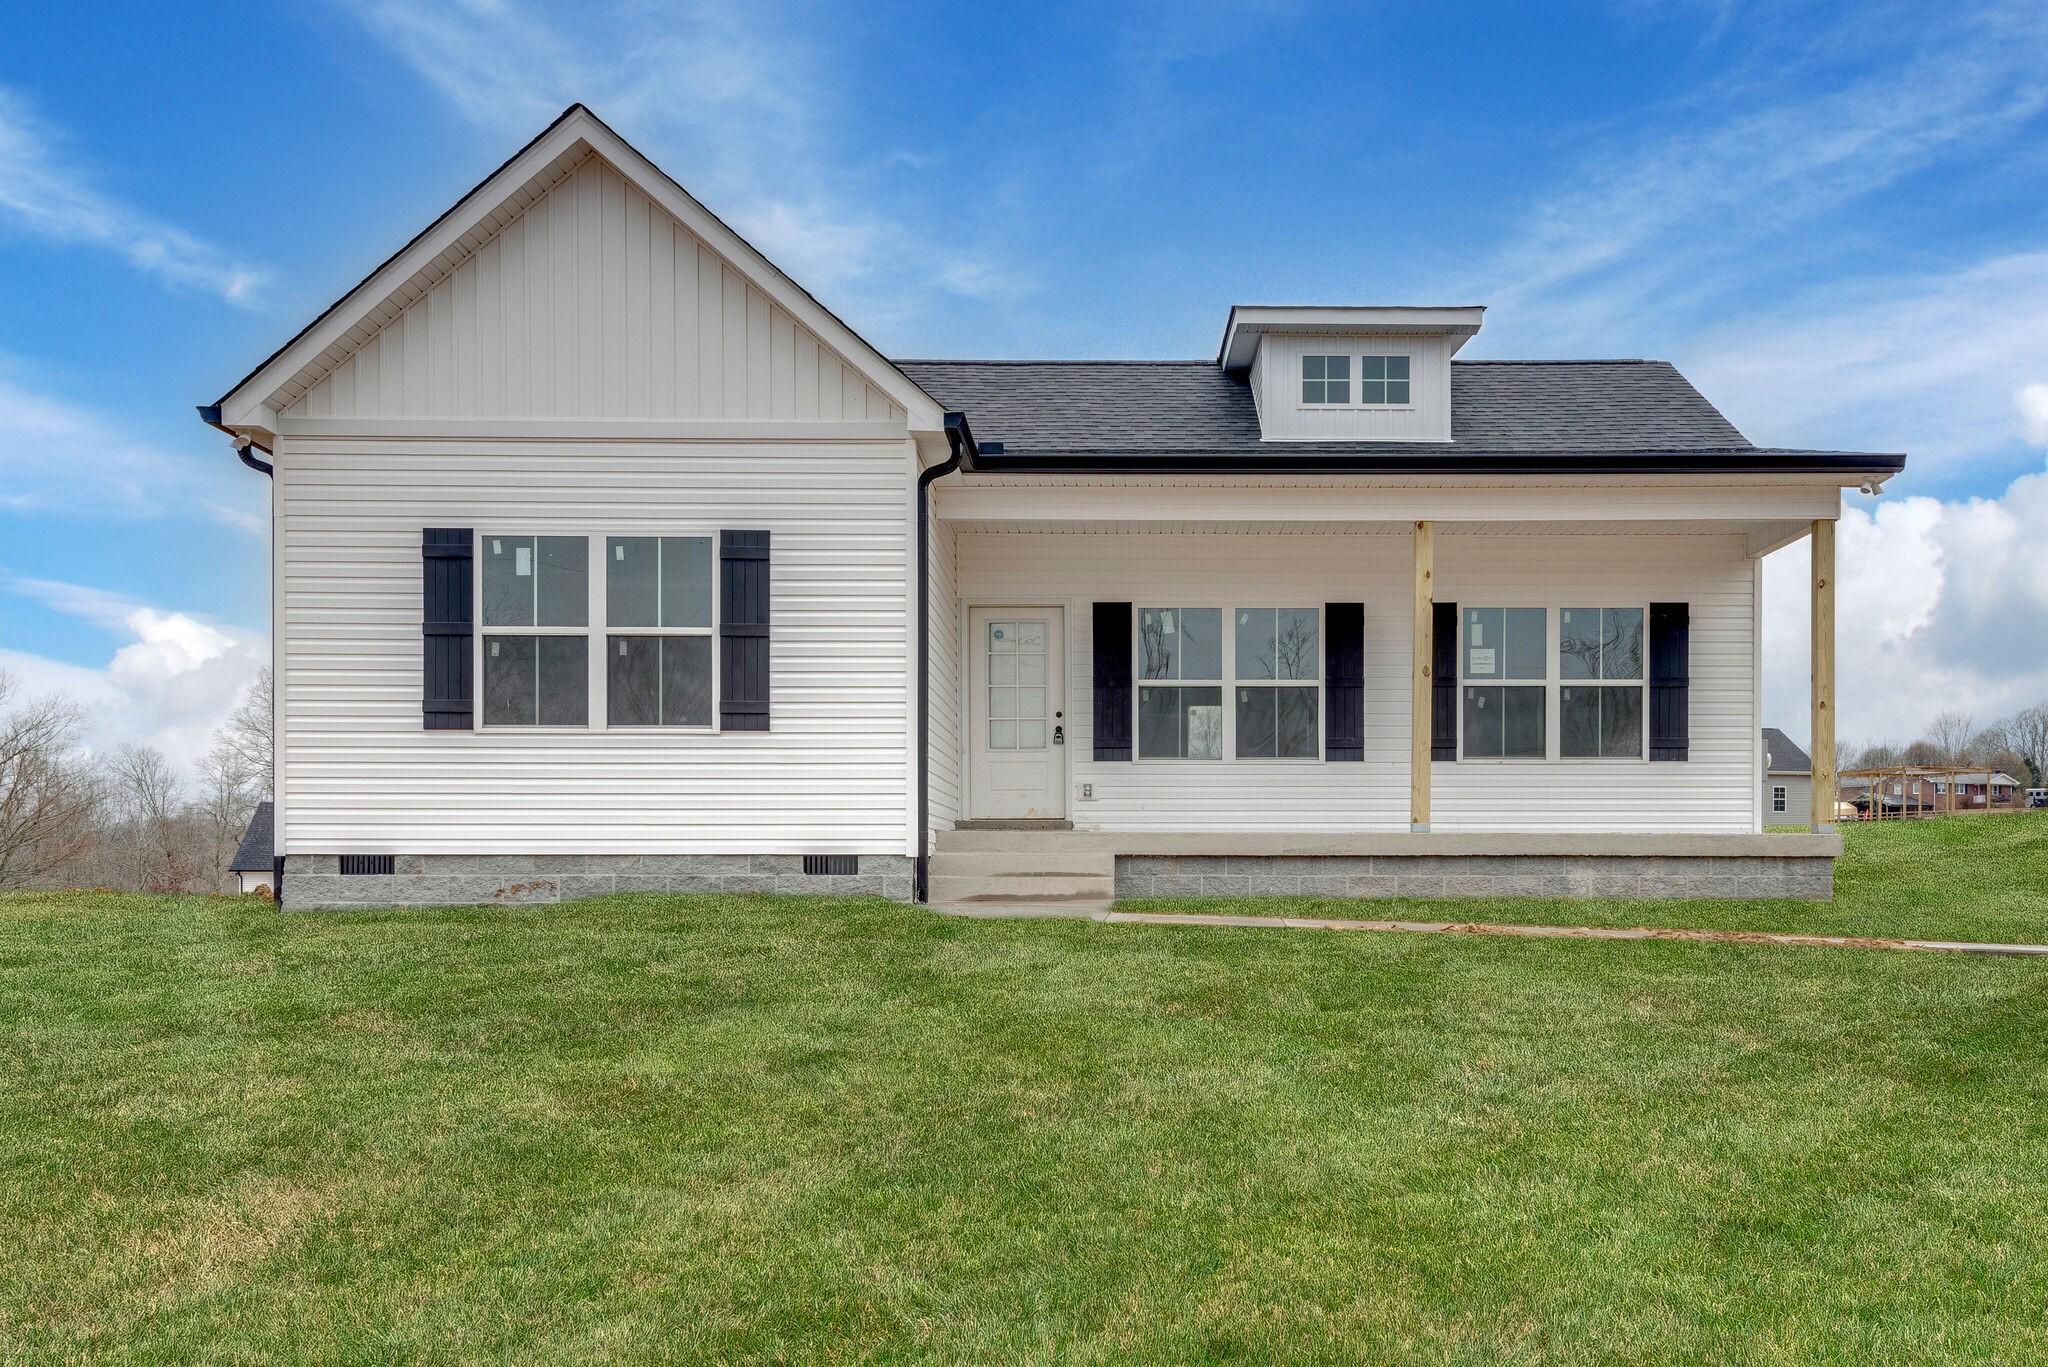 3671 Hwy. 47 N (Lot 26) Property Photo - Charlotte, TN real estate listing